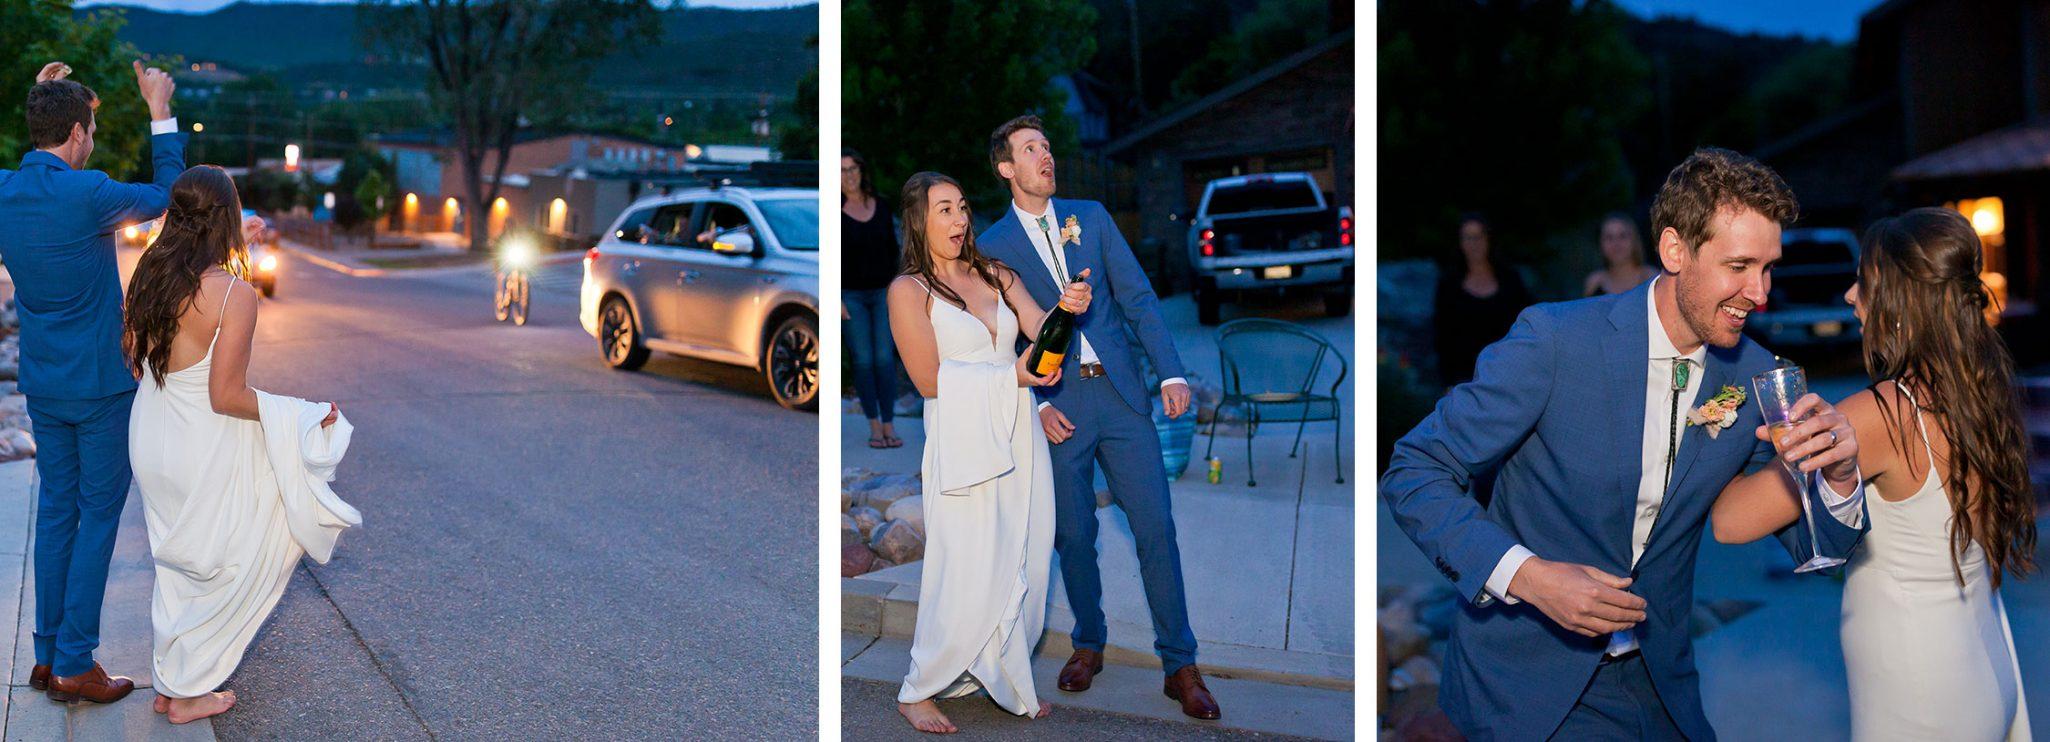 Just married dancing